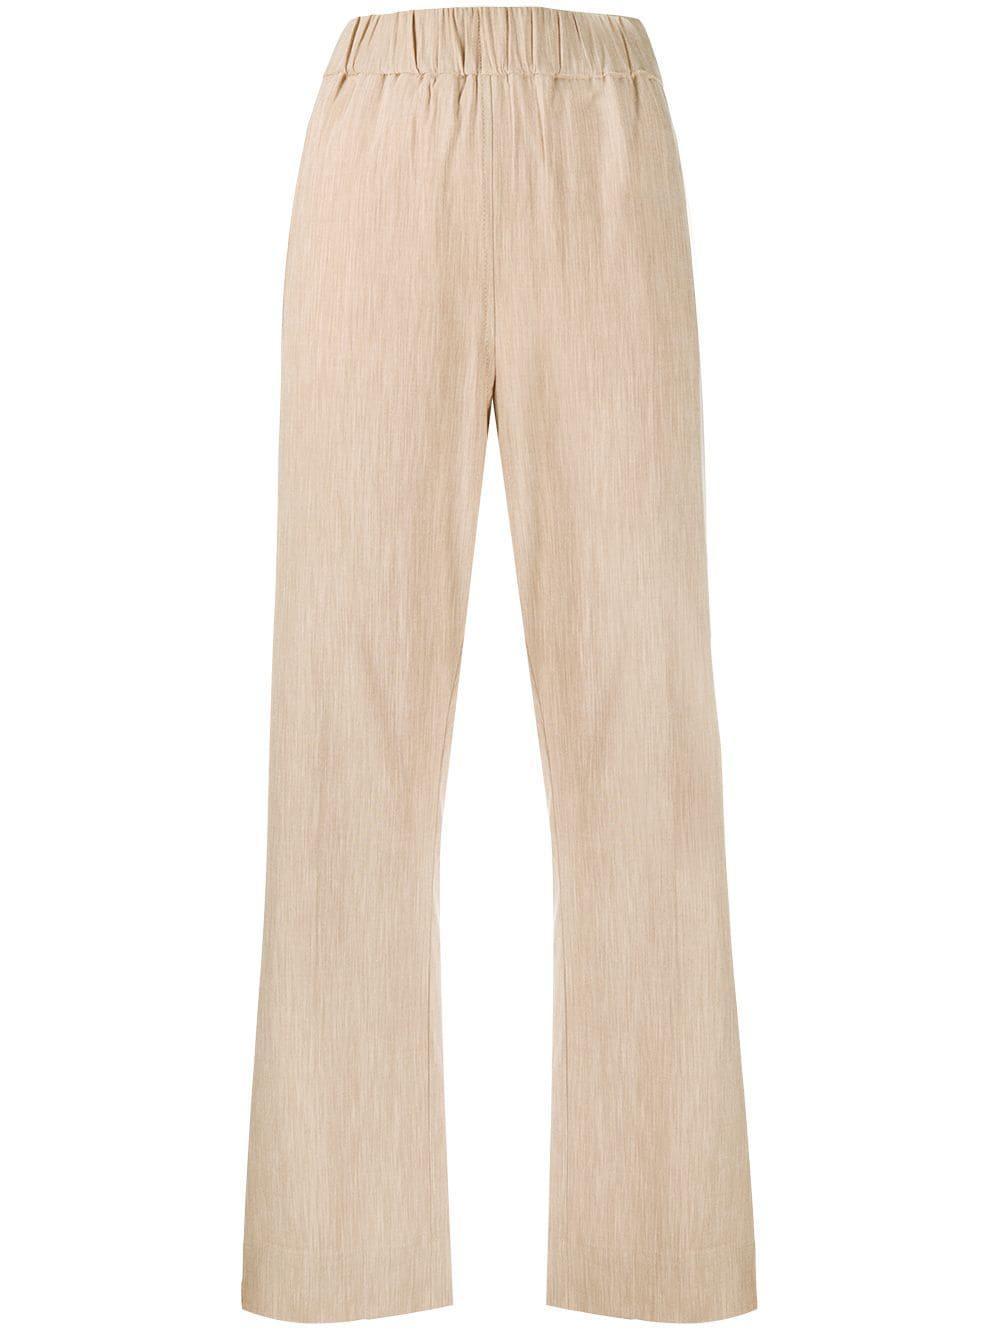 Melange Suiting Elastic Waist Pants Item # F5058